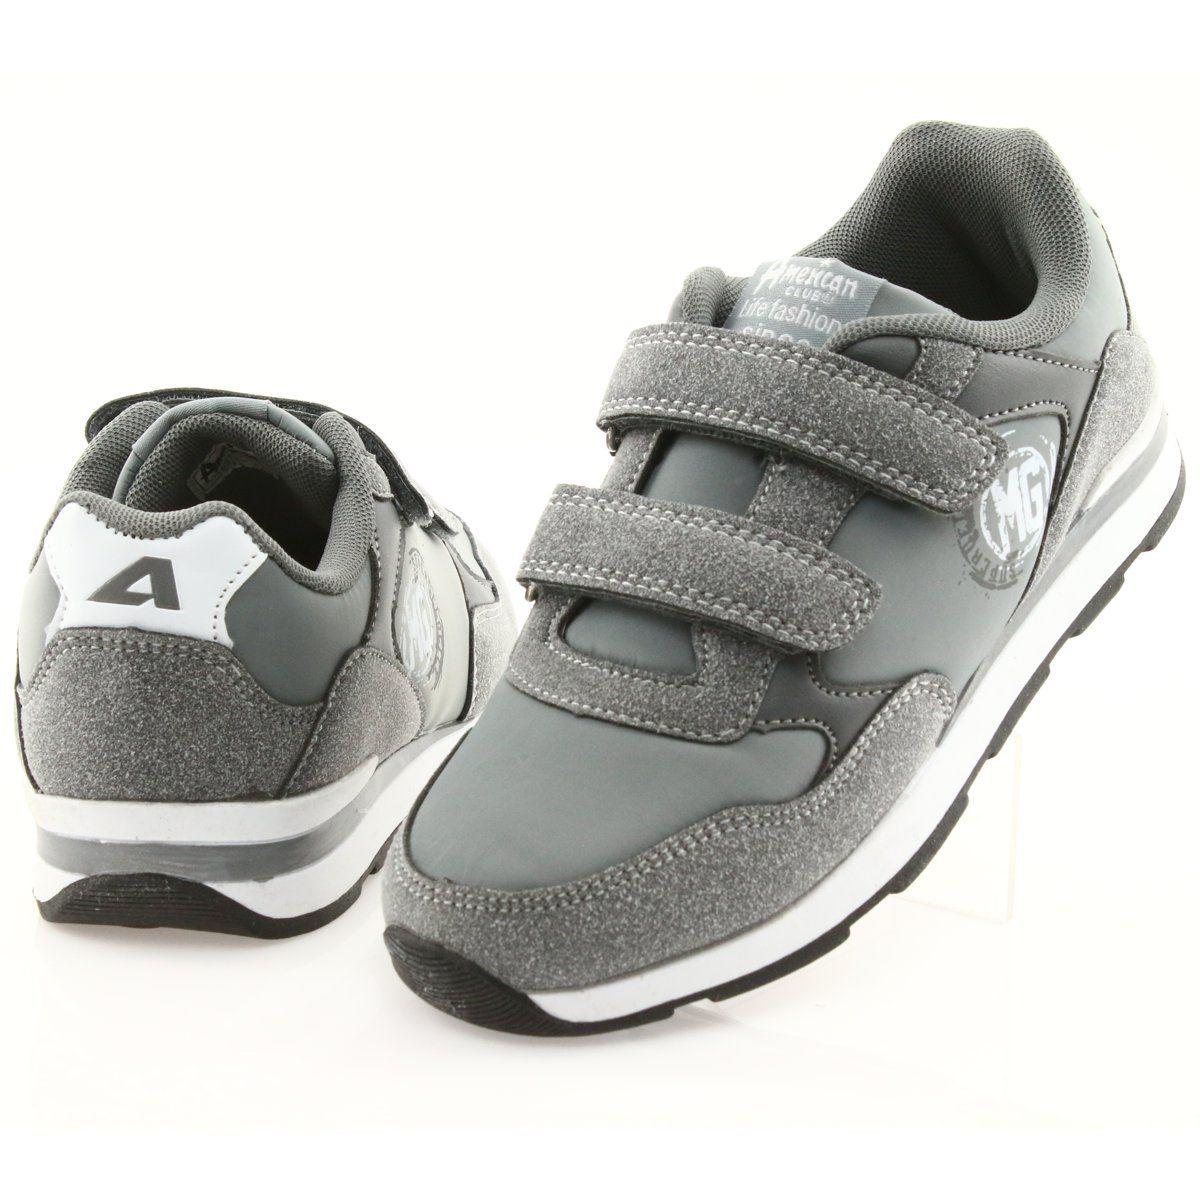 American Club Rzepy Wkladka Skorzana Bs01 Biale Szare Comfortable Shoes Kid Shoes Leather